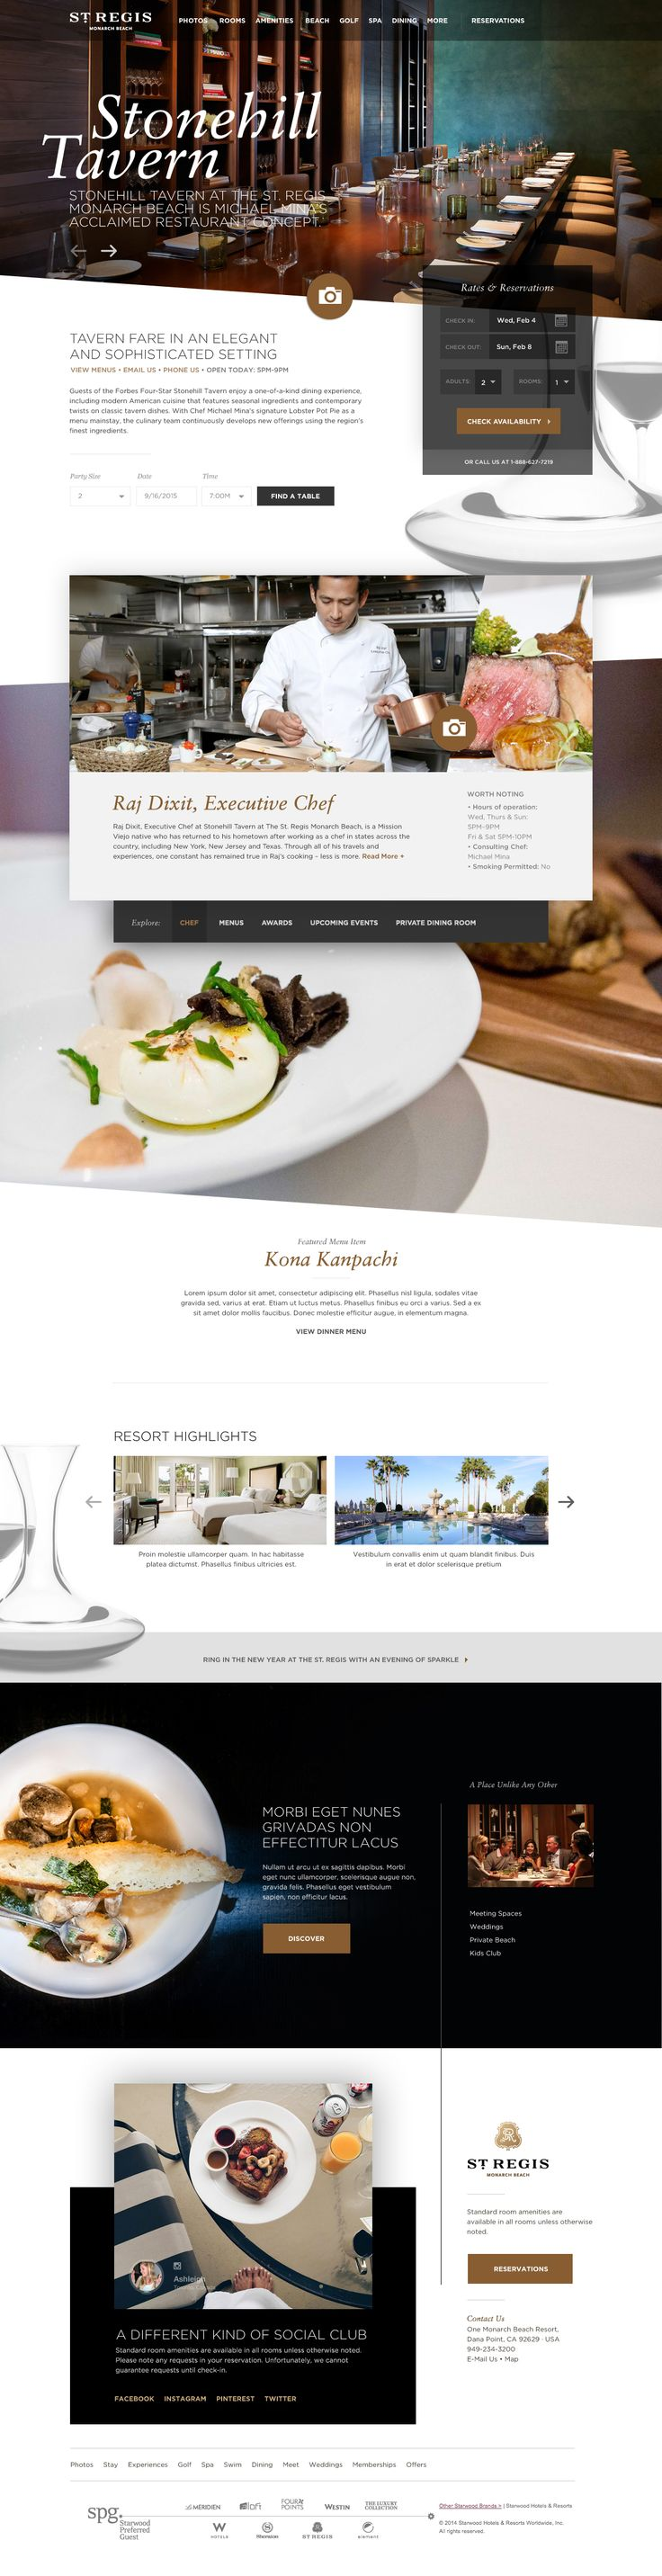 St. Regis Monarch Beach Resort Website on Behance